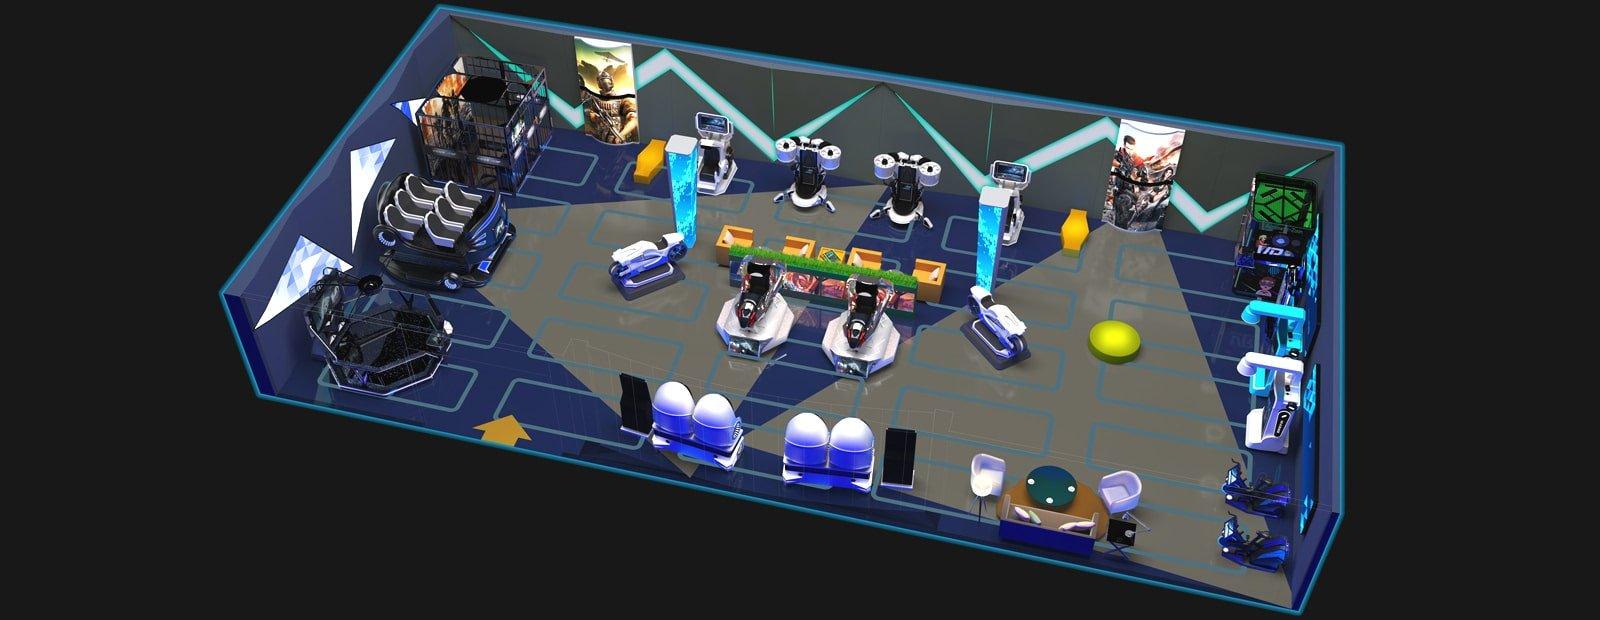 VR Theme Park China 300 Square Meter